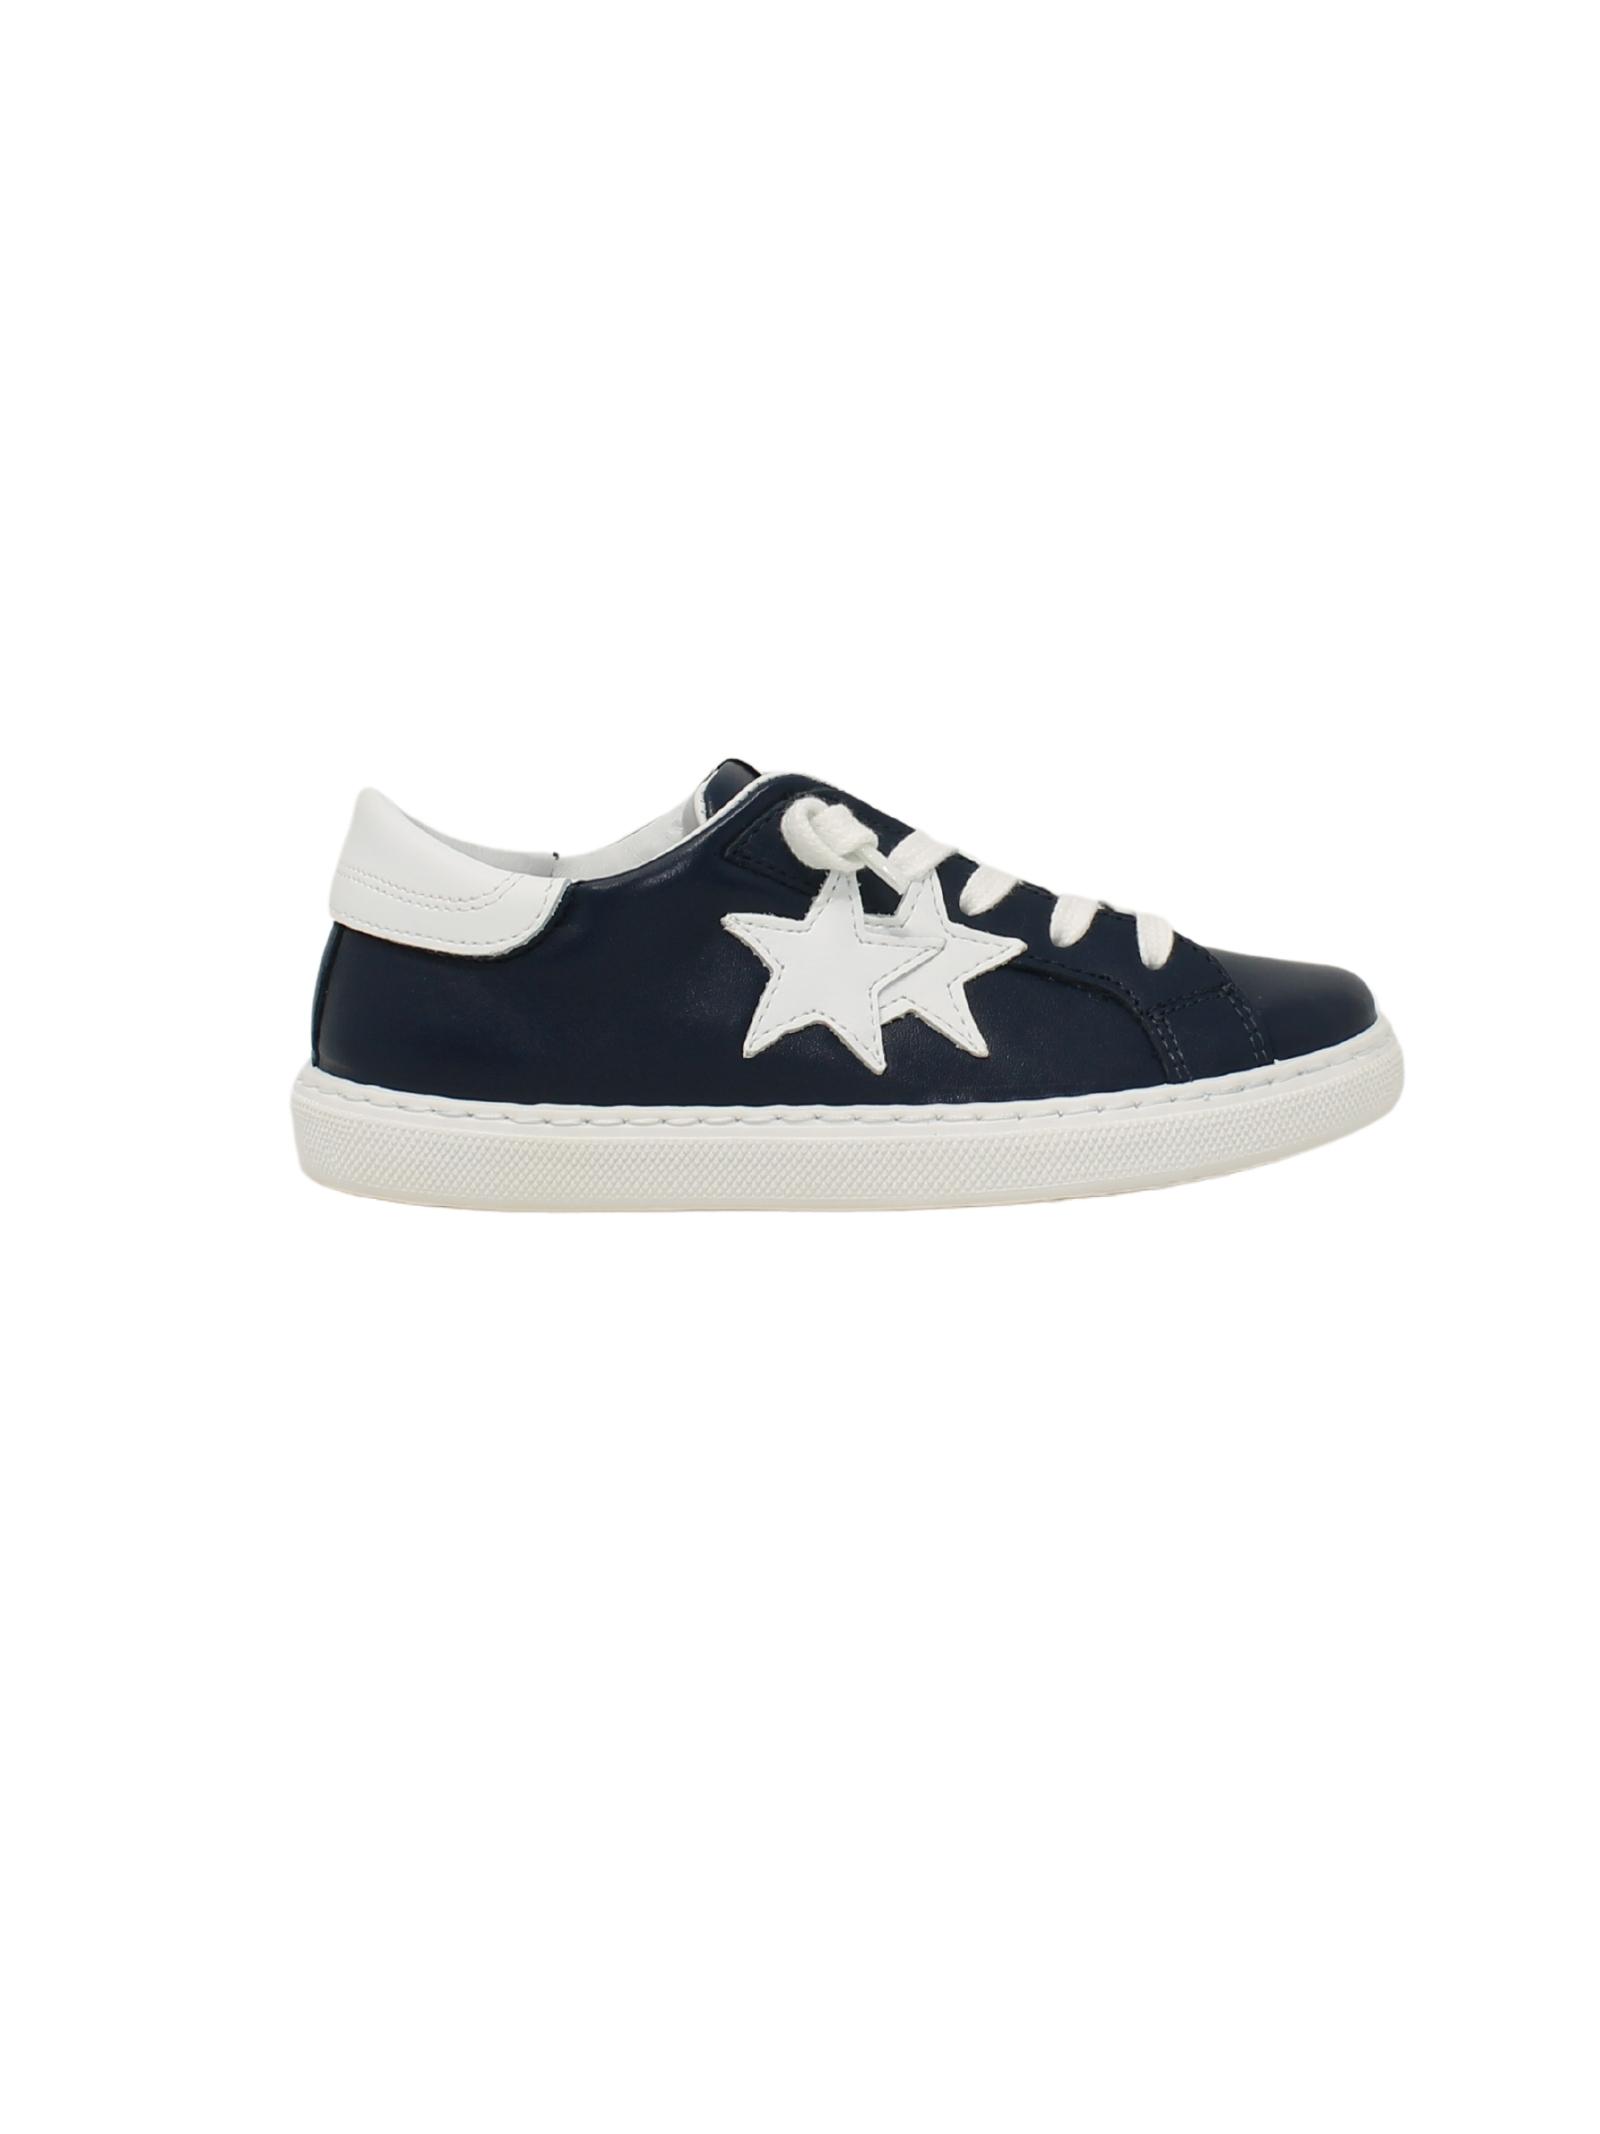 Sneakers Low Blu White Bambino 2STAR KIDS | Sneakers | 2SB2264BLU/BIANCO